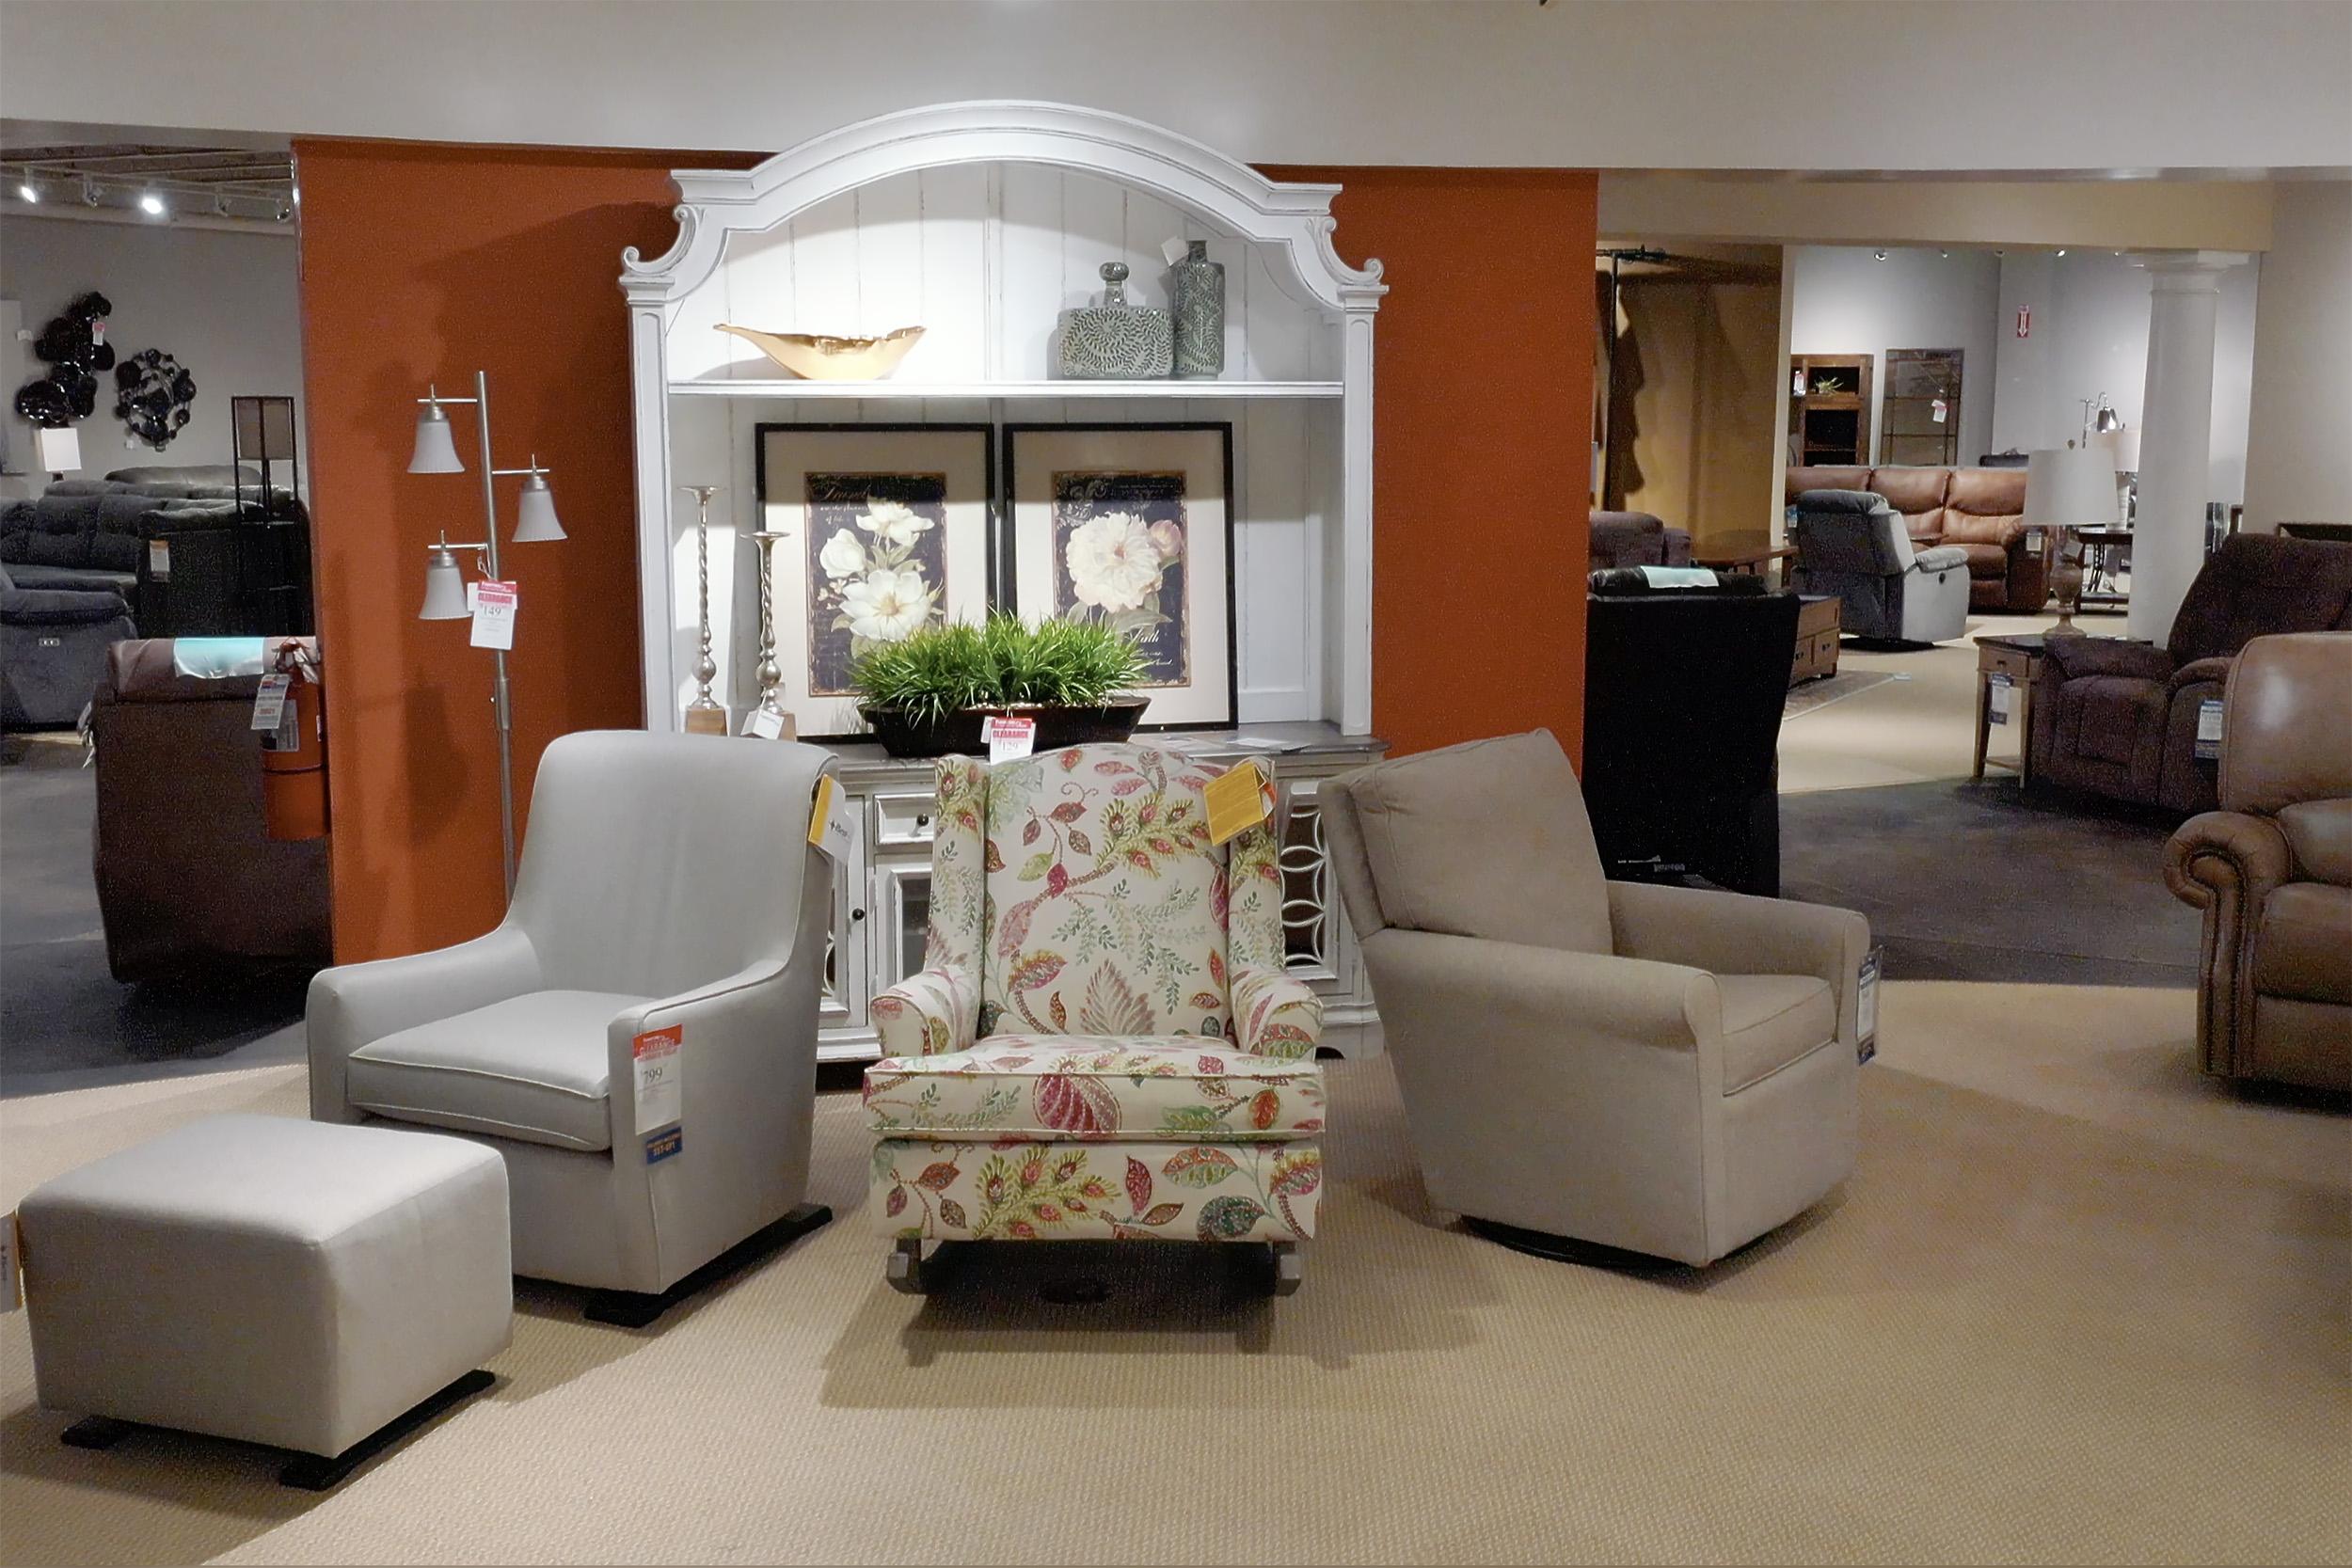 Interior Drone shot of Furniture Store